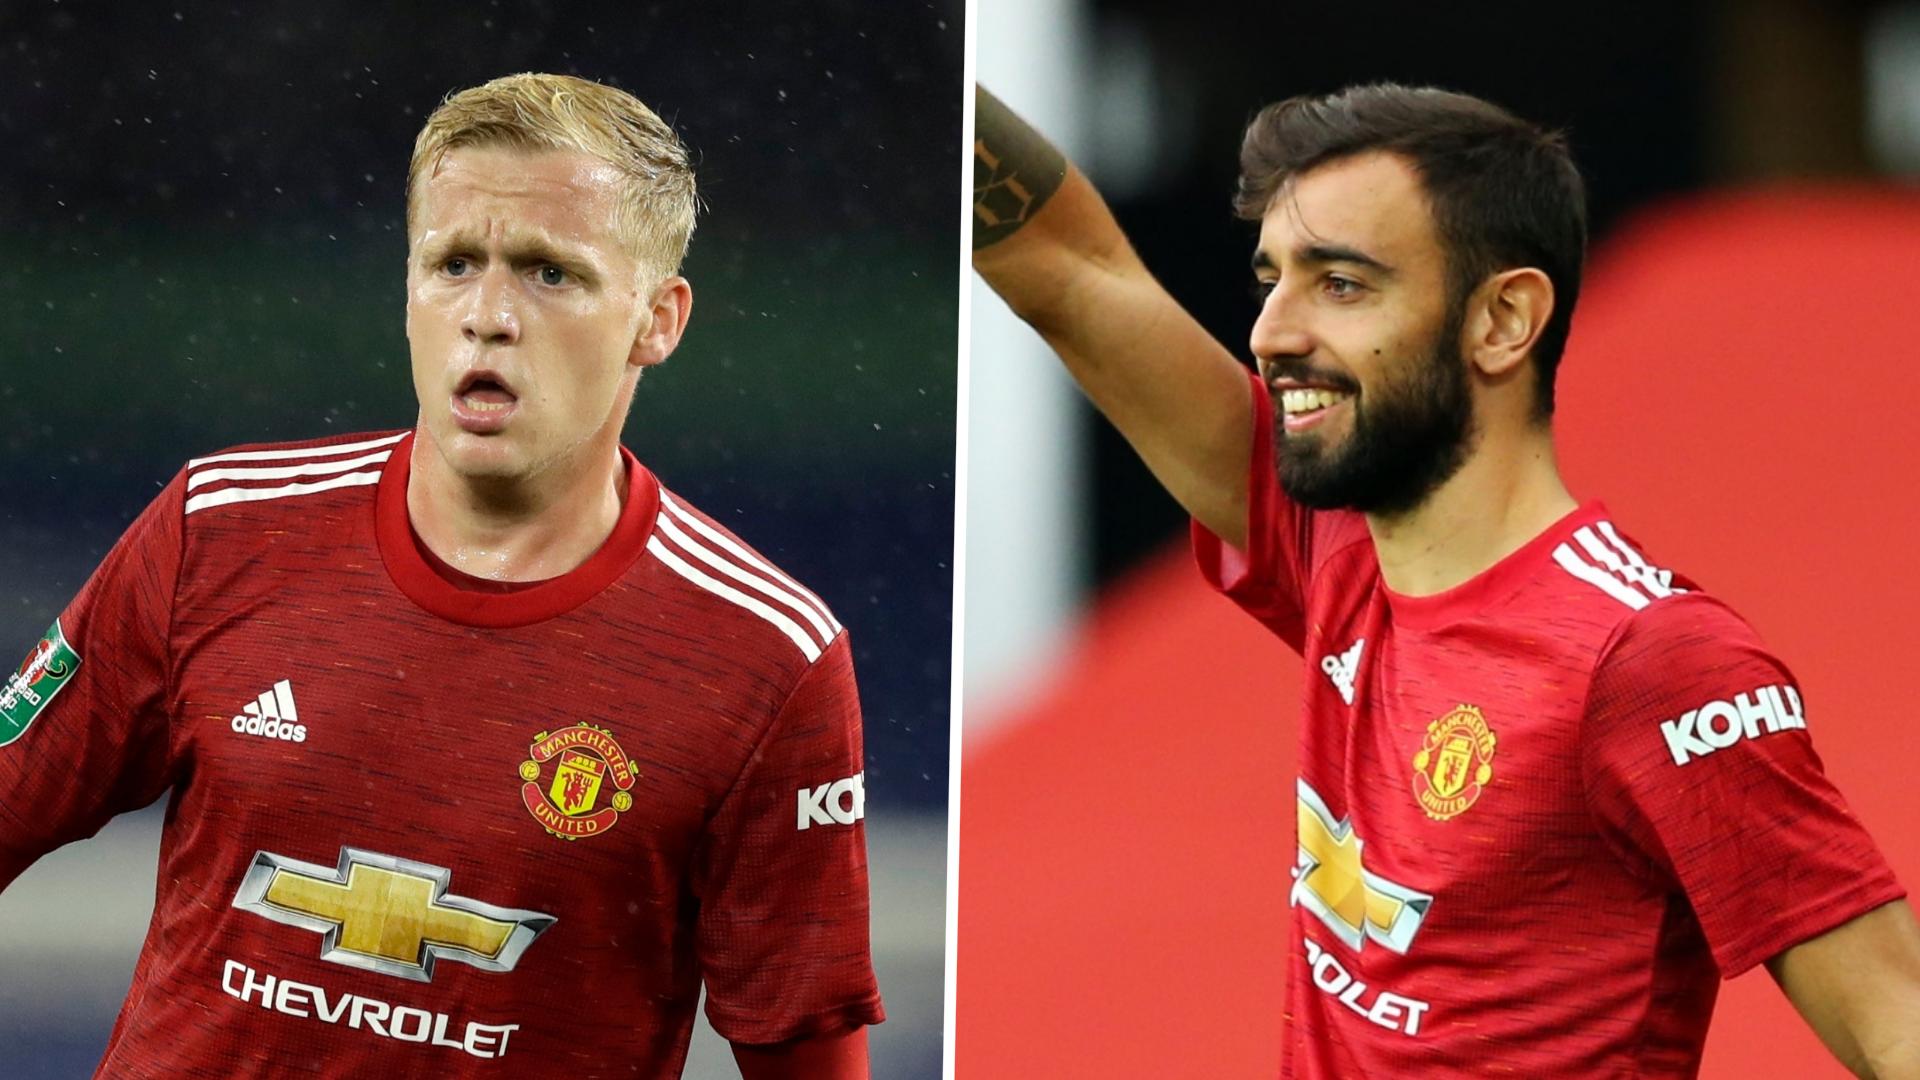 'Bruno benefited from Van de Beek' - Star midfielders could form key partnership for Man Utd, say Ferdinand and Scholes